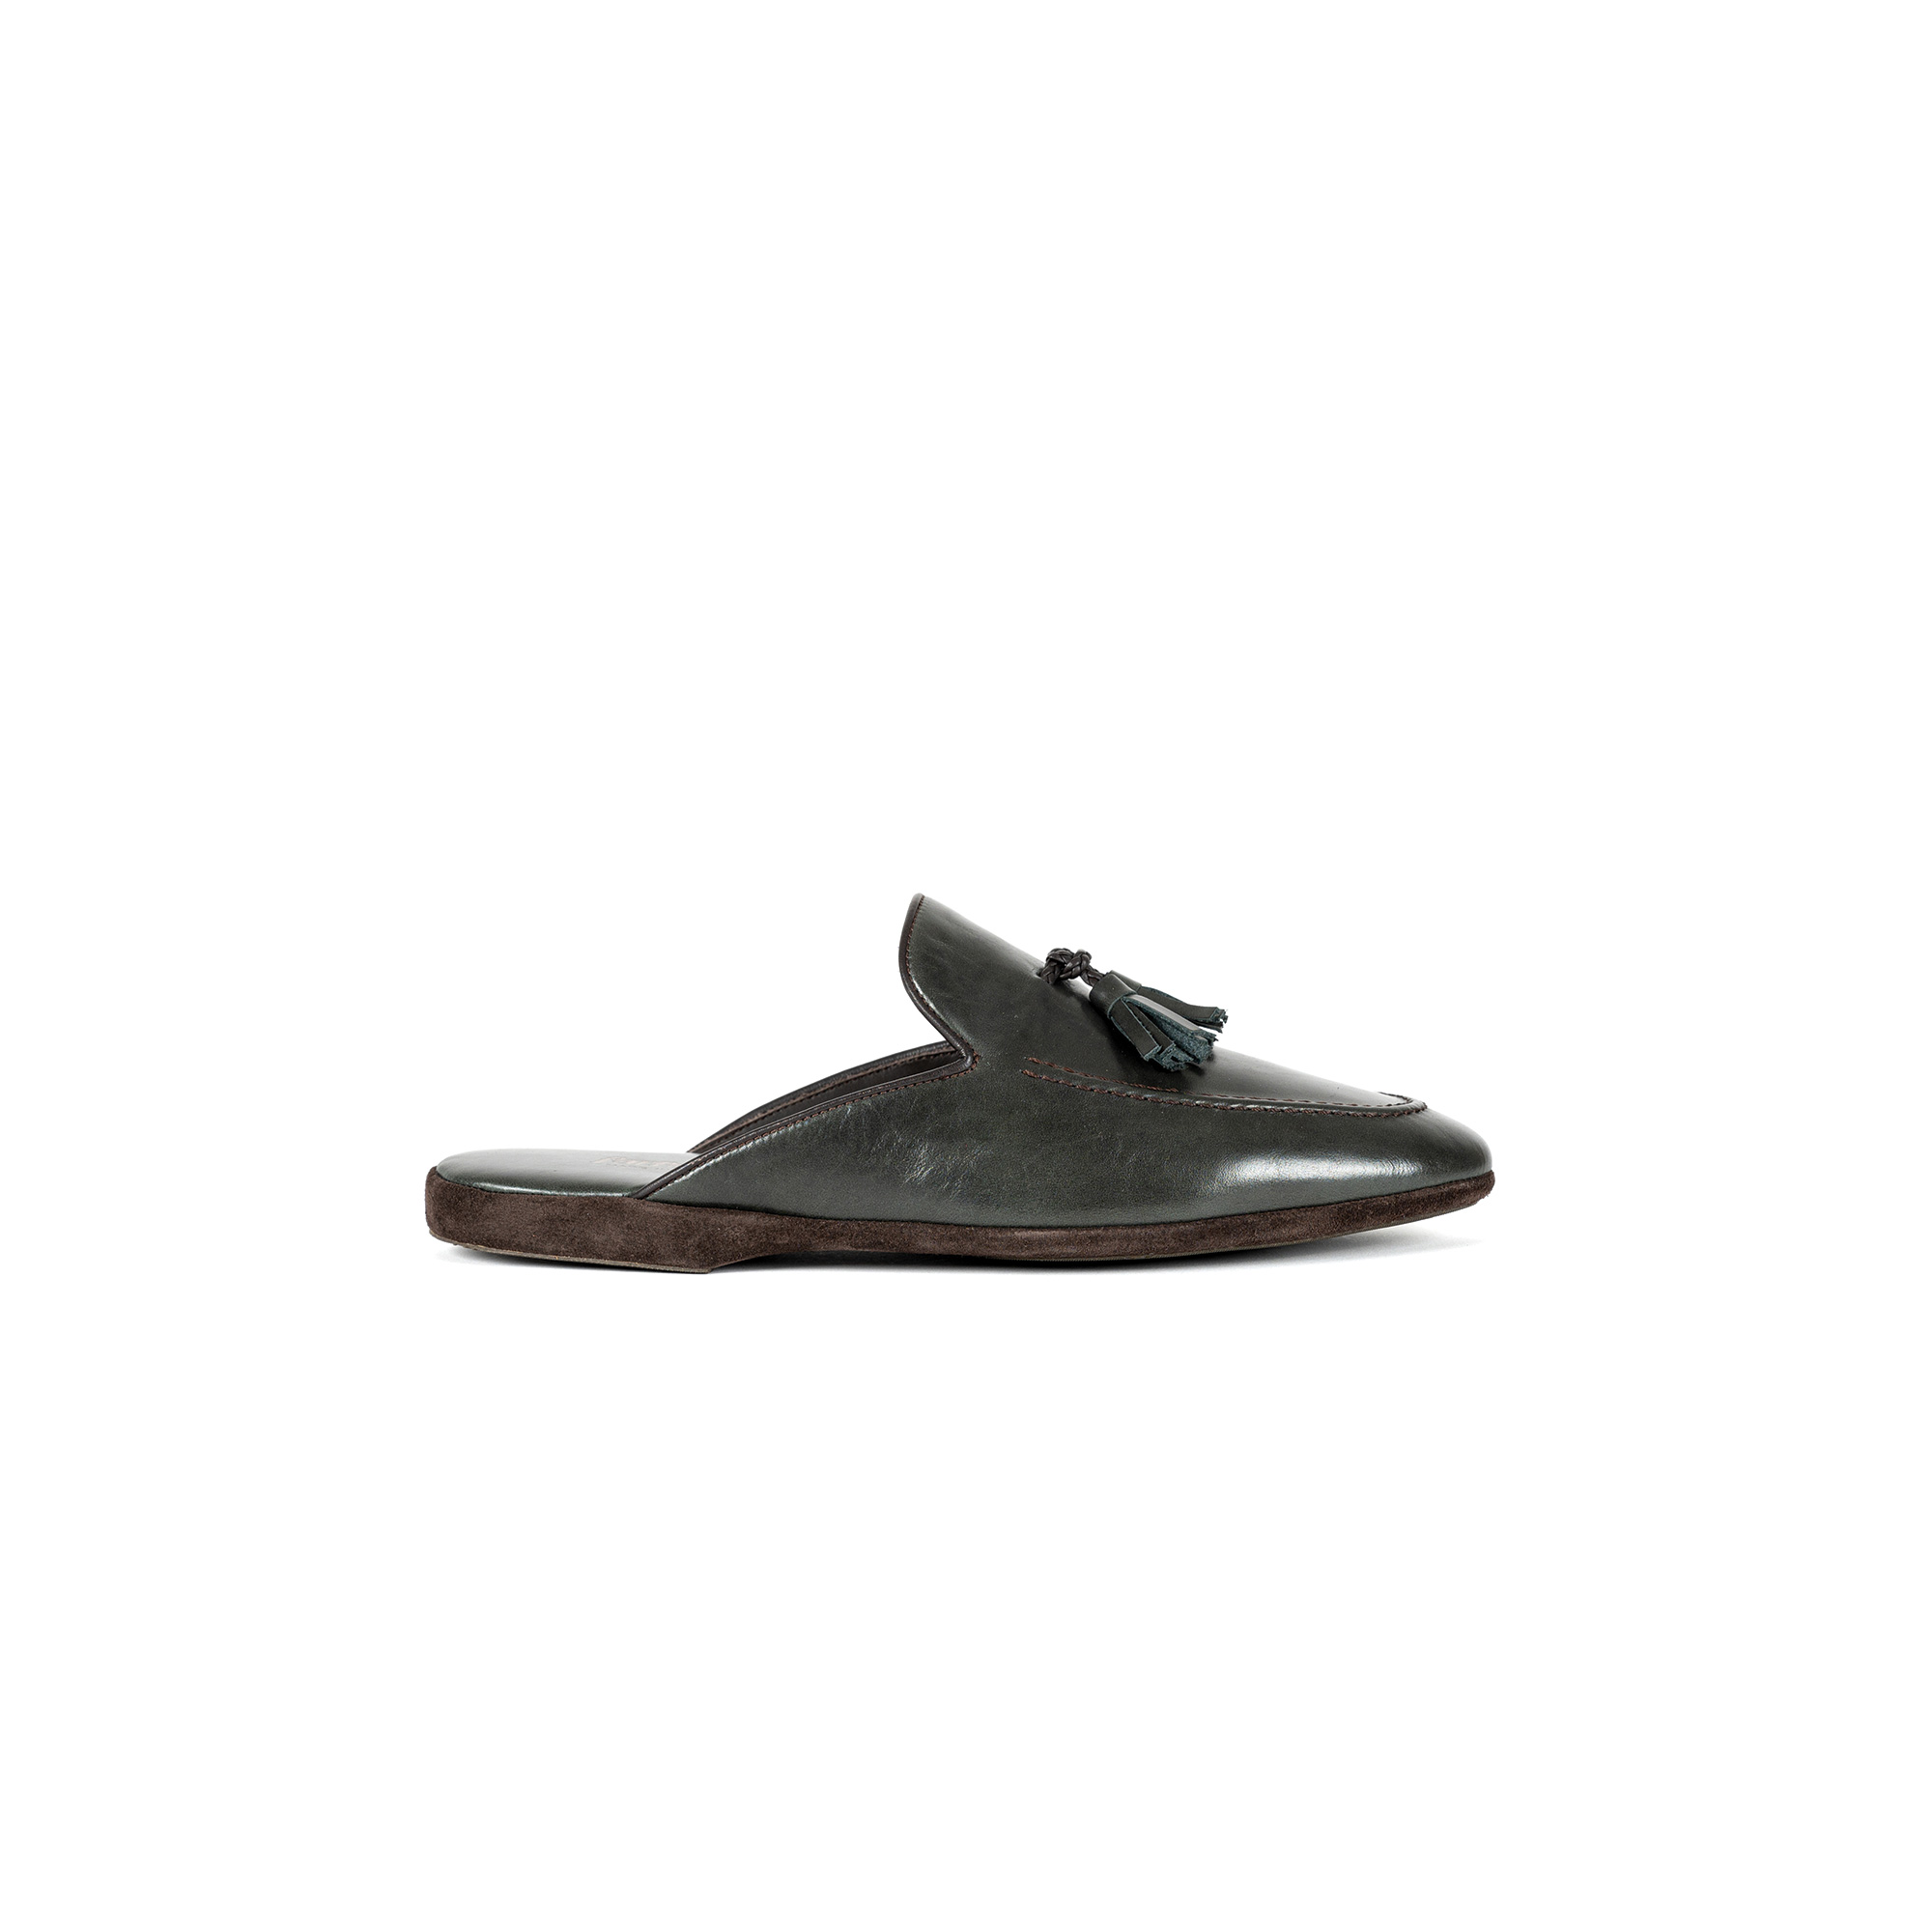 Indoor classic slipper in green calf leather - Farfalla italian slippers